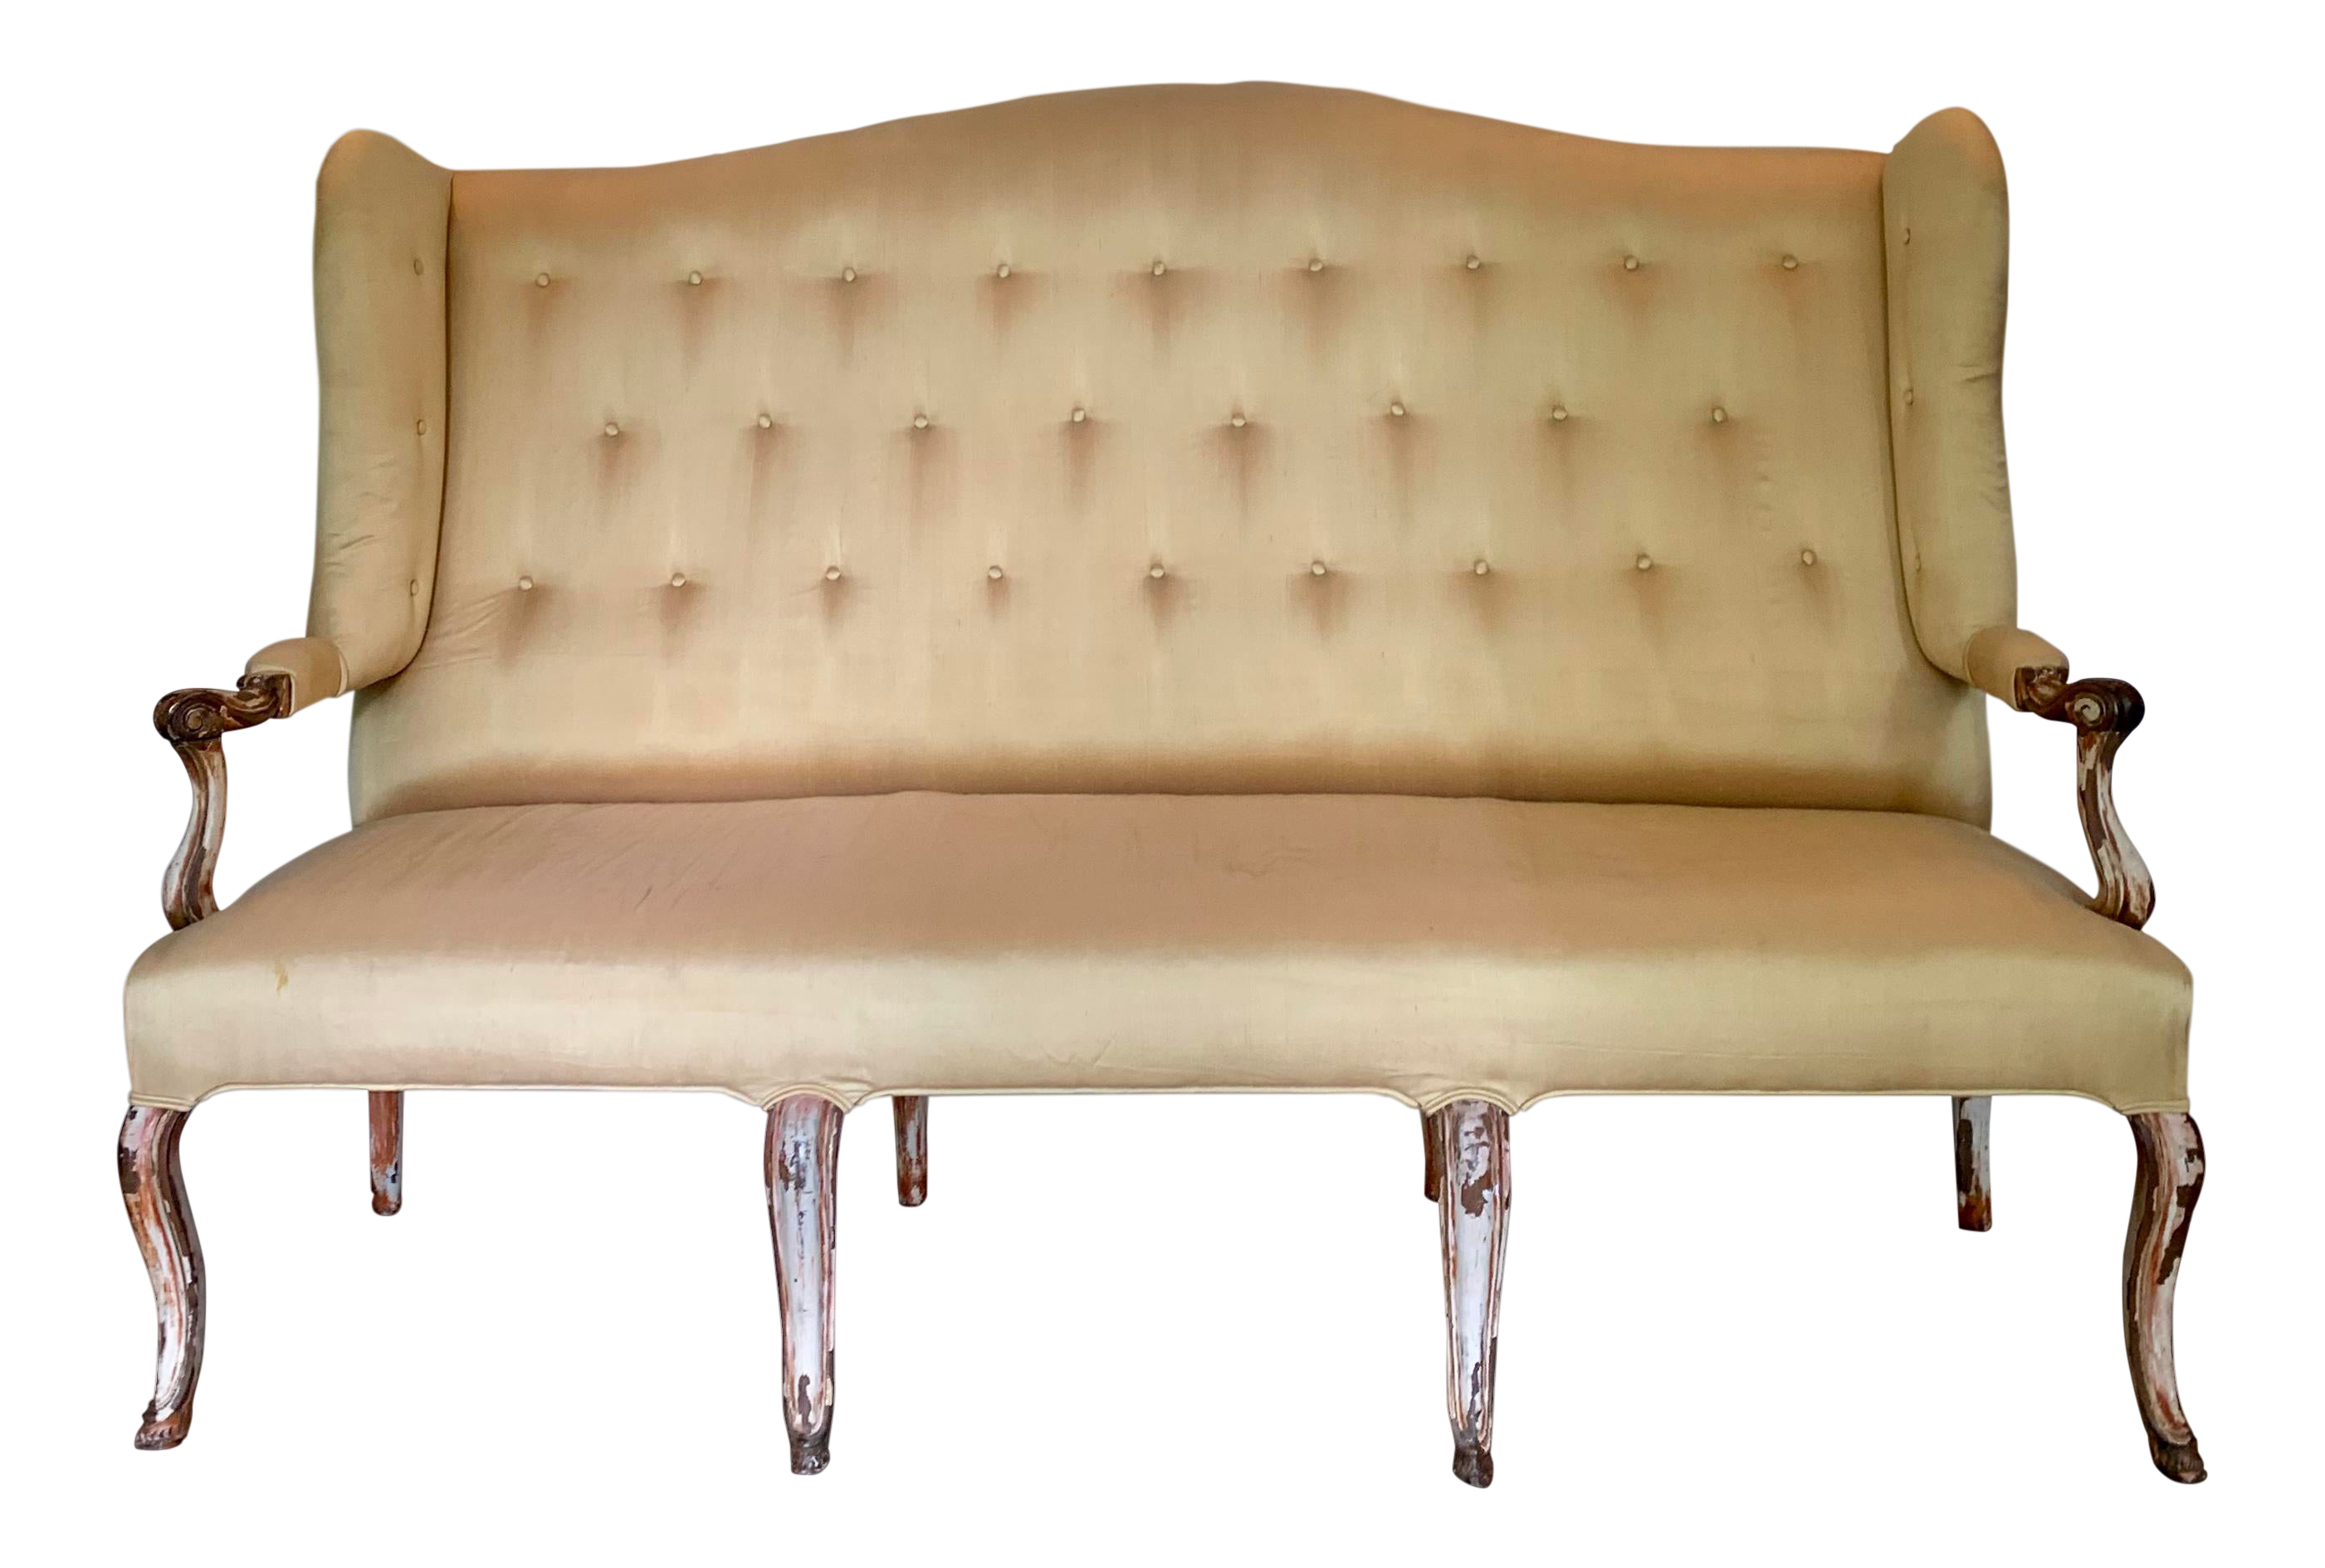 19th Century Wonderful Italian-Style Sofa